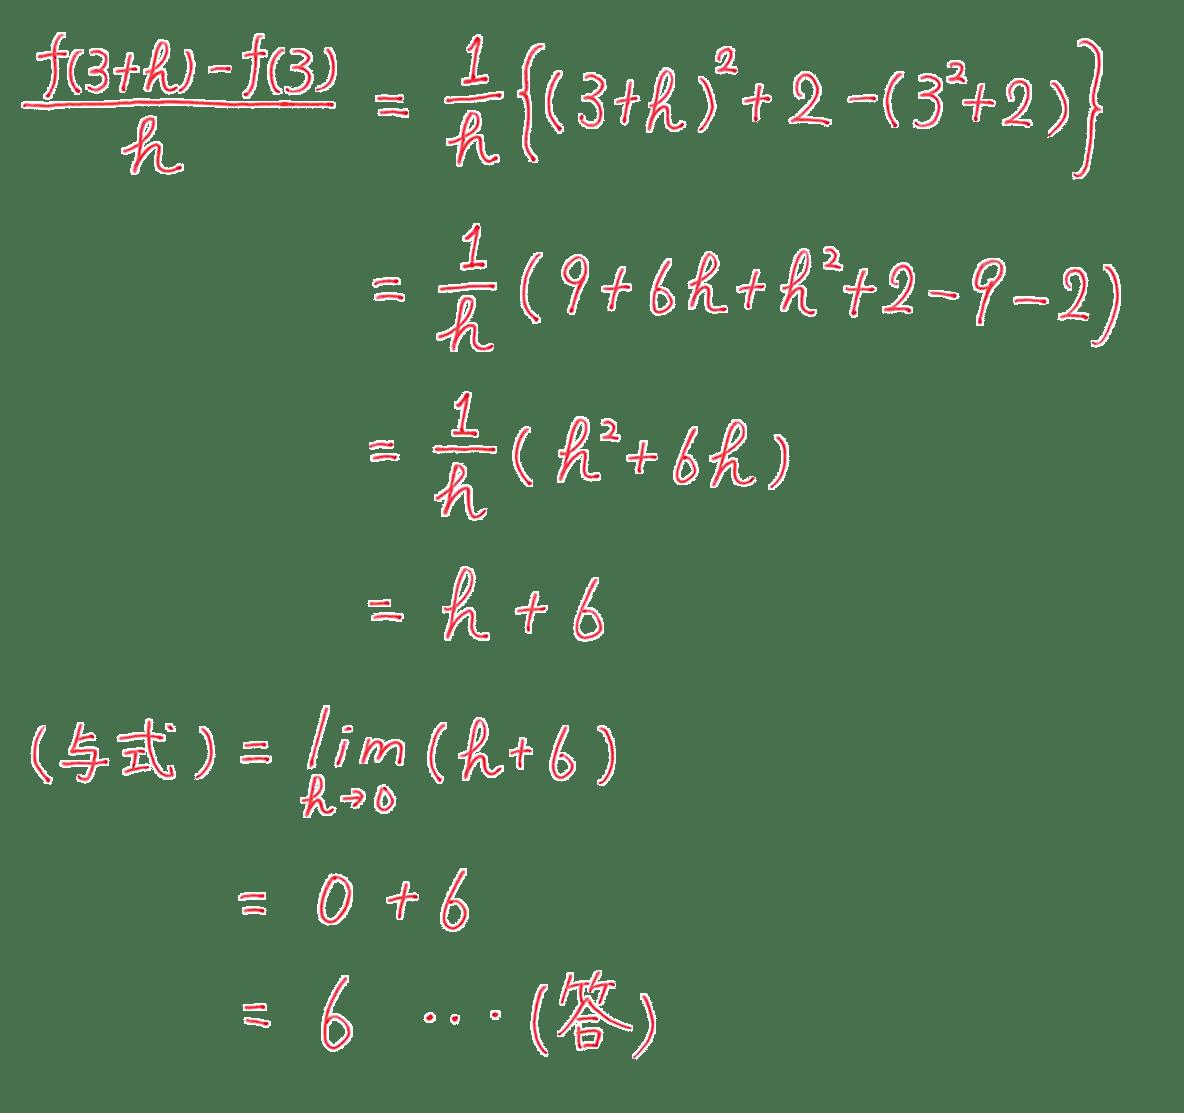 高校数学Ⅱ 微分法と積分法2 練習 答え